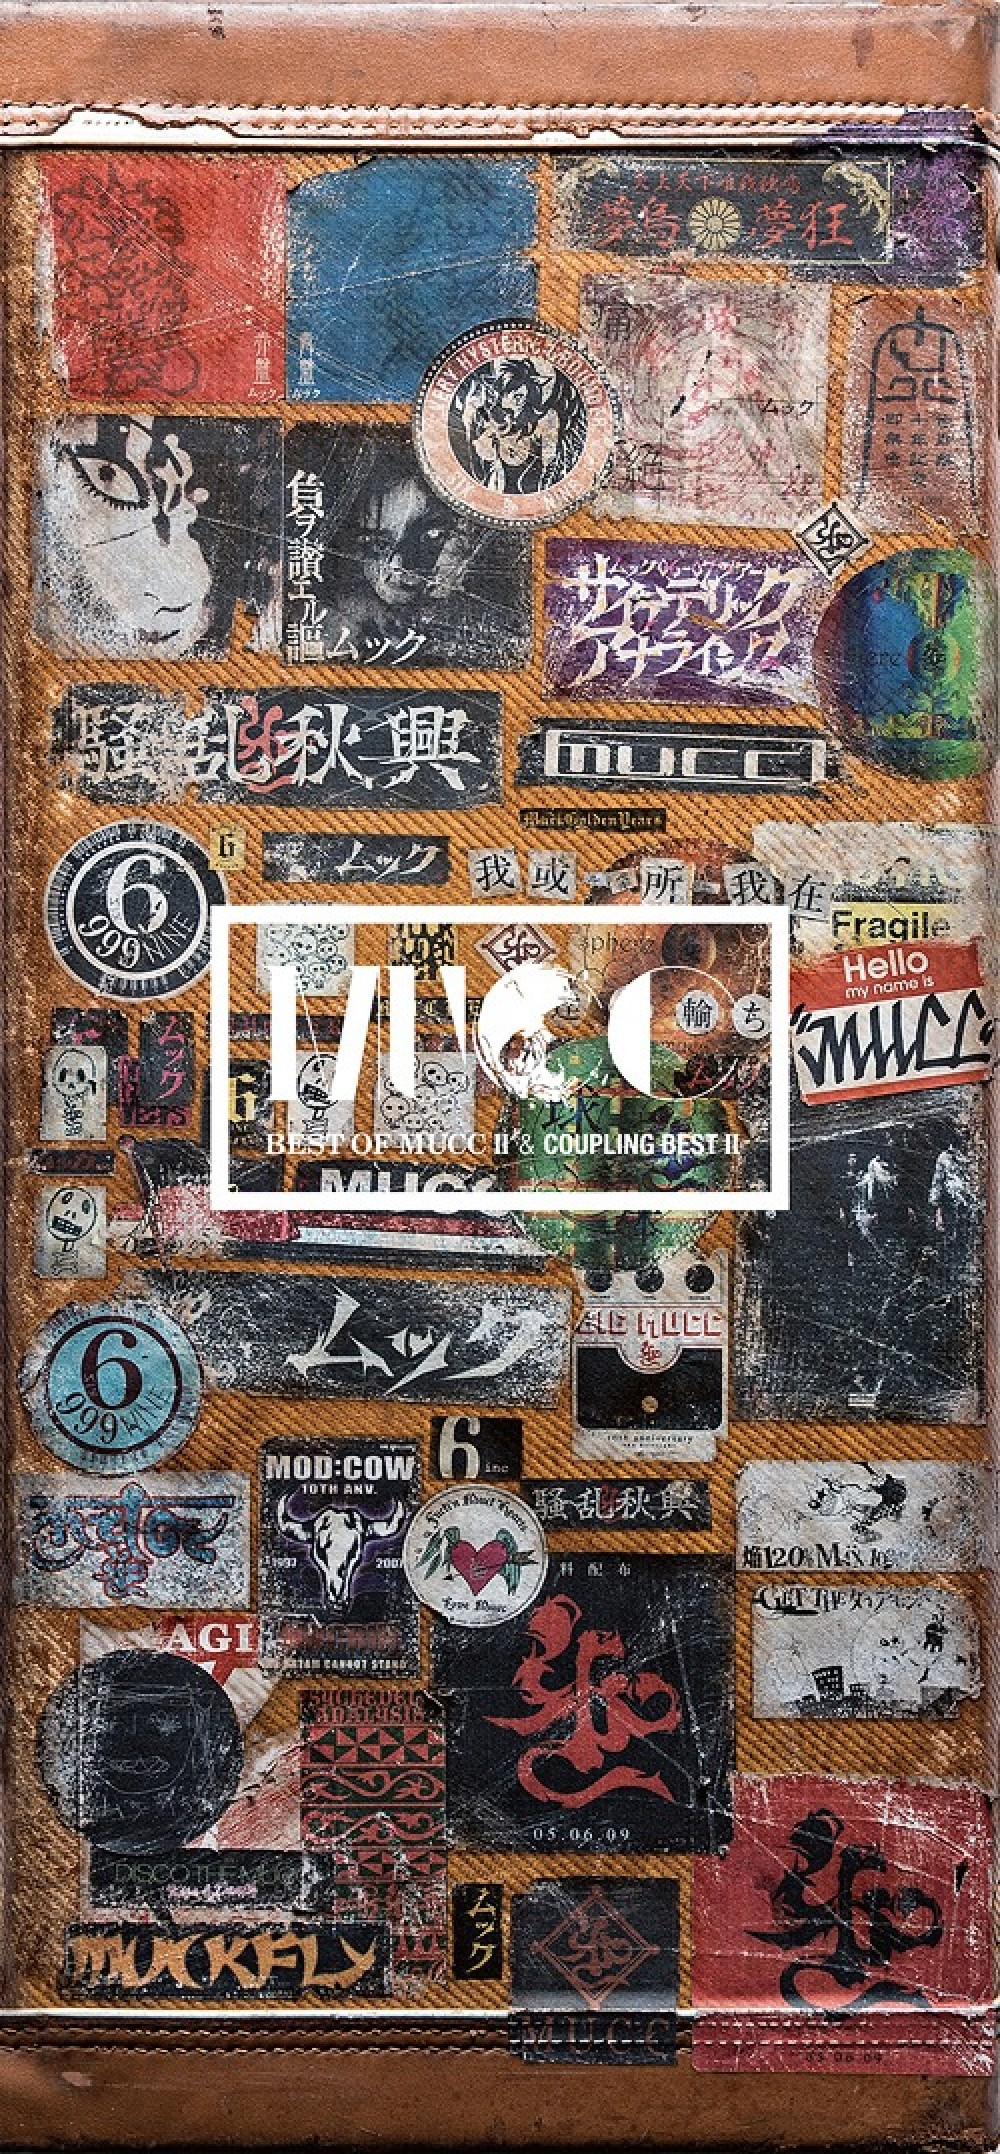 JRock247-MUCC-Best-II-Coupling-II-limited-edition-case